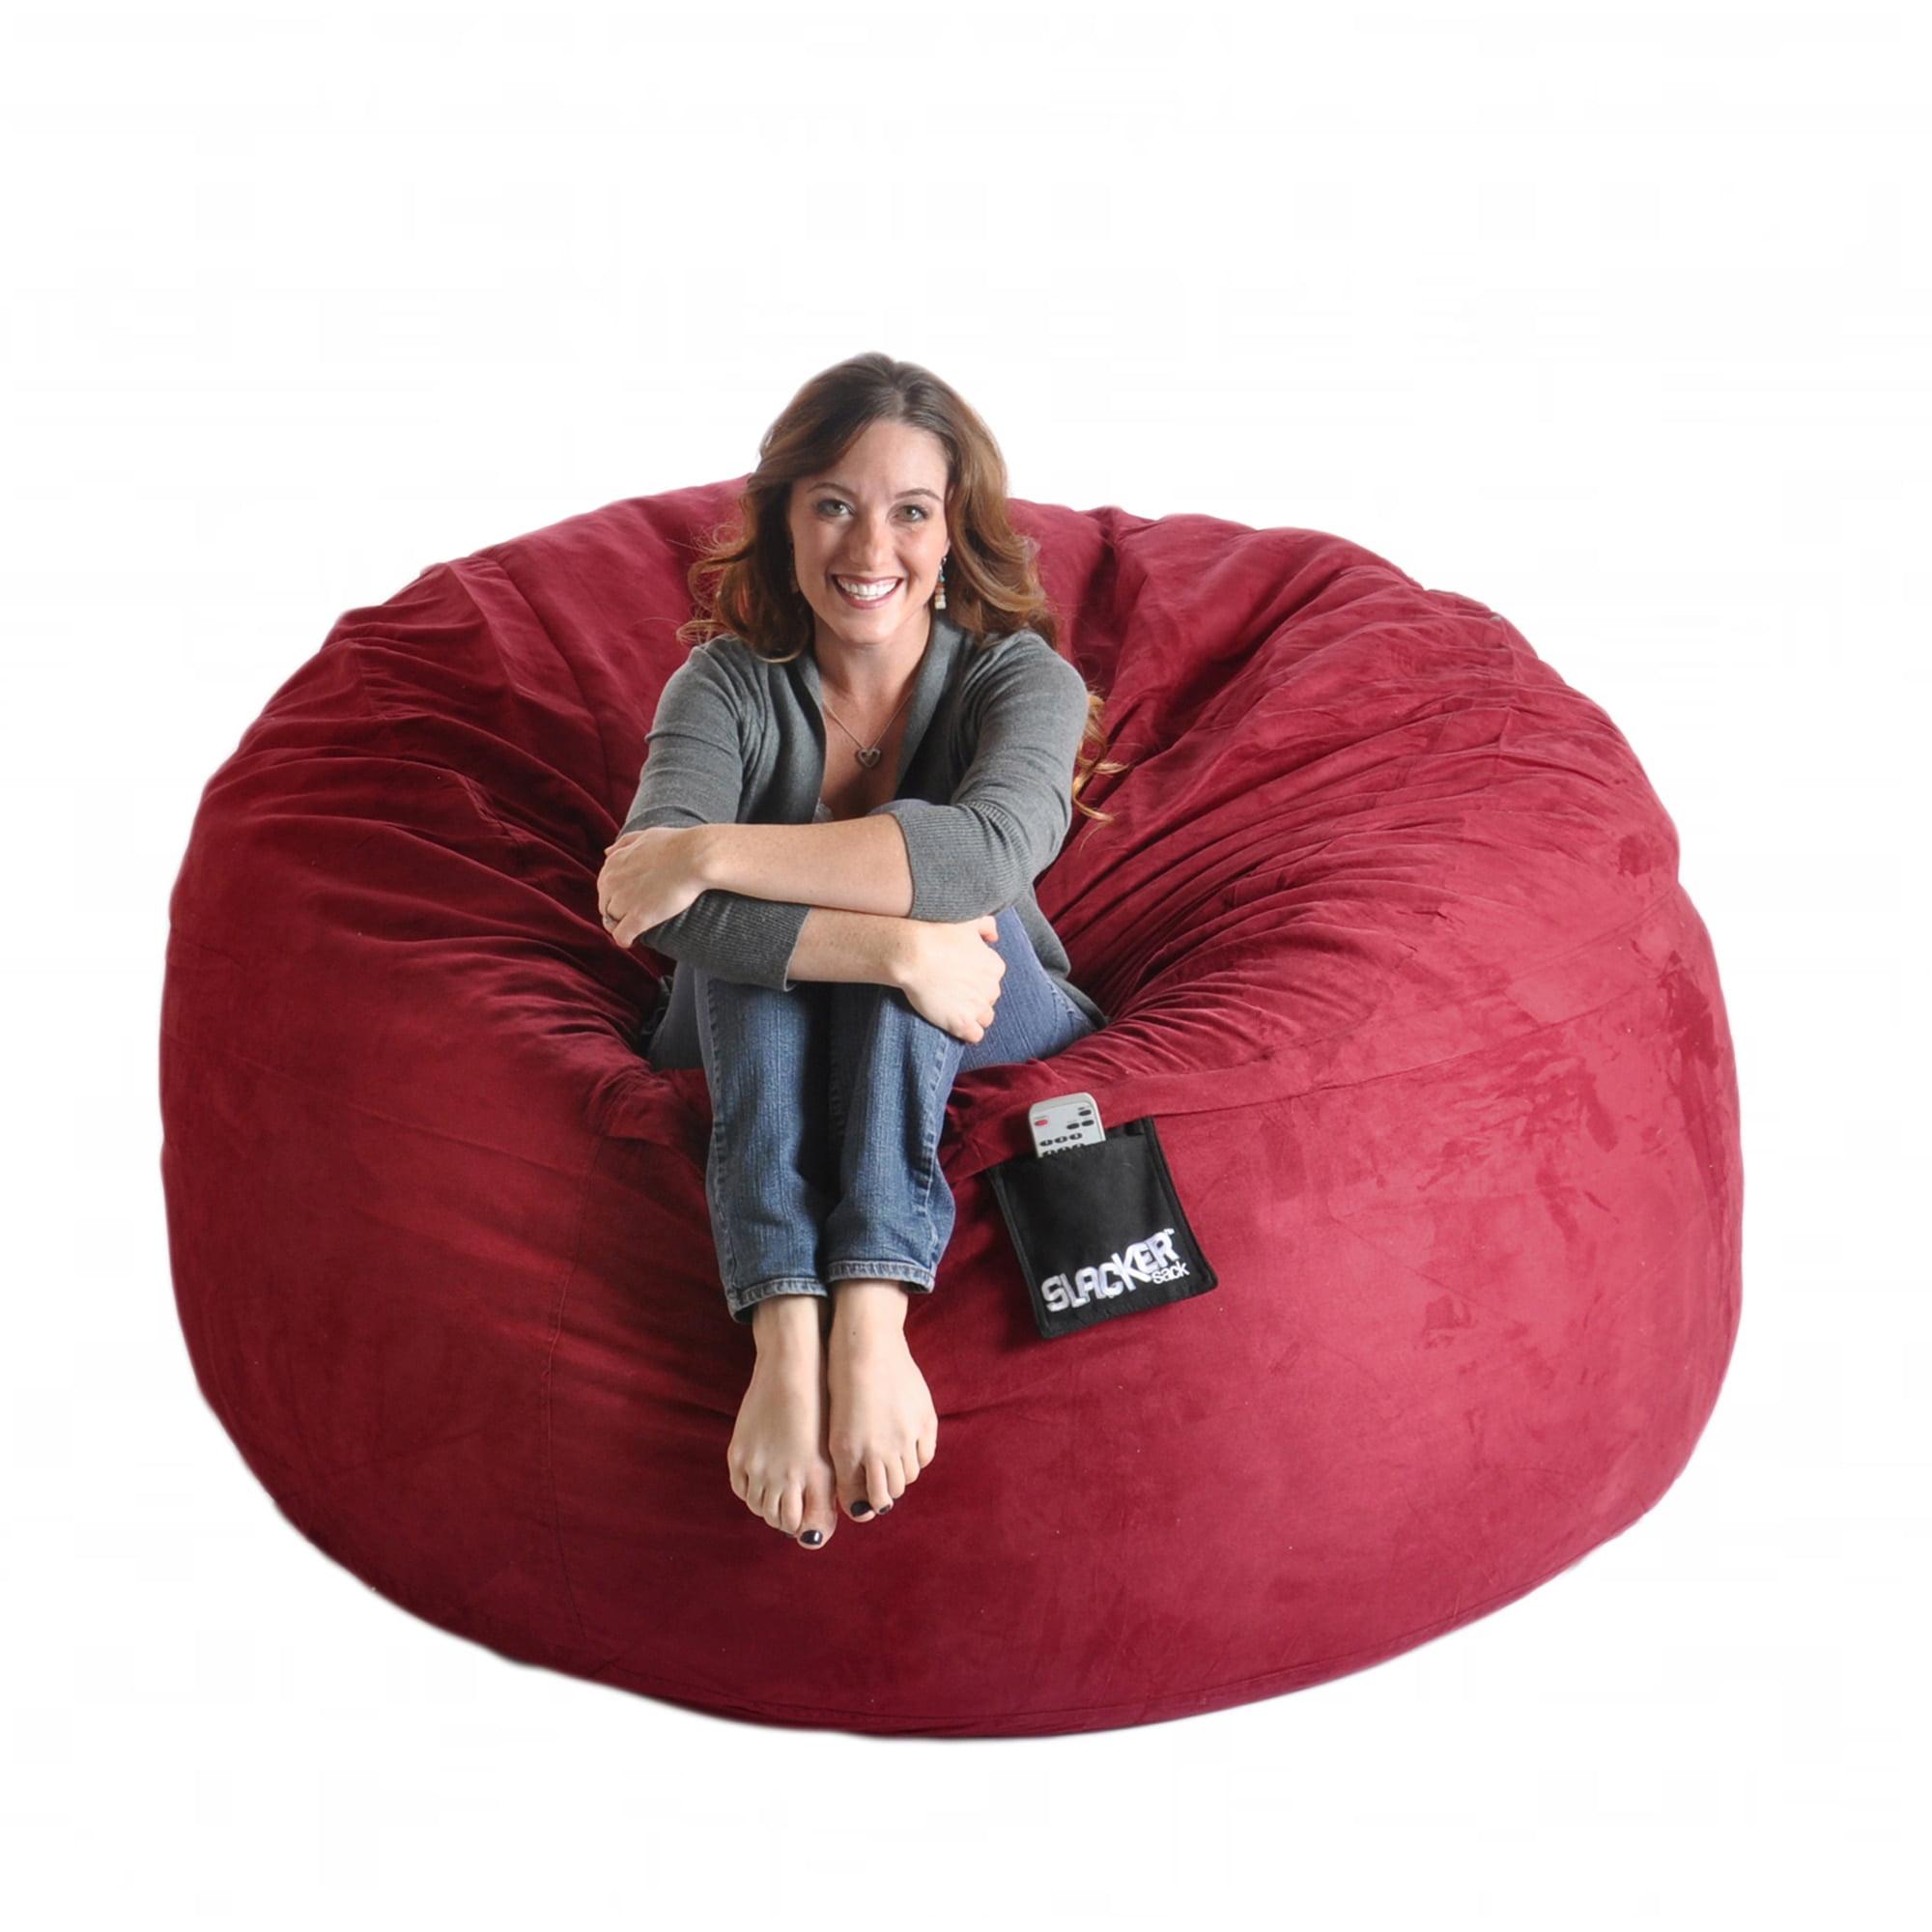 Slacker Sack Cinnabar Red 6-foot Microfiber and Foam Bean Bag